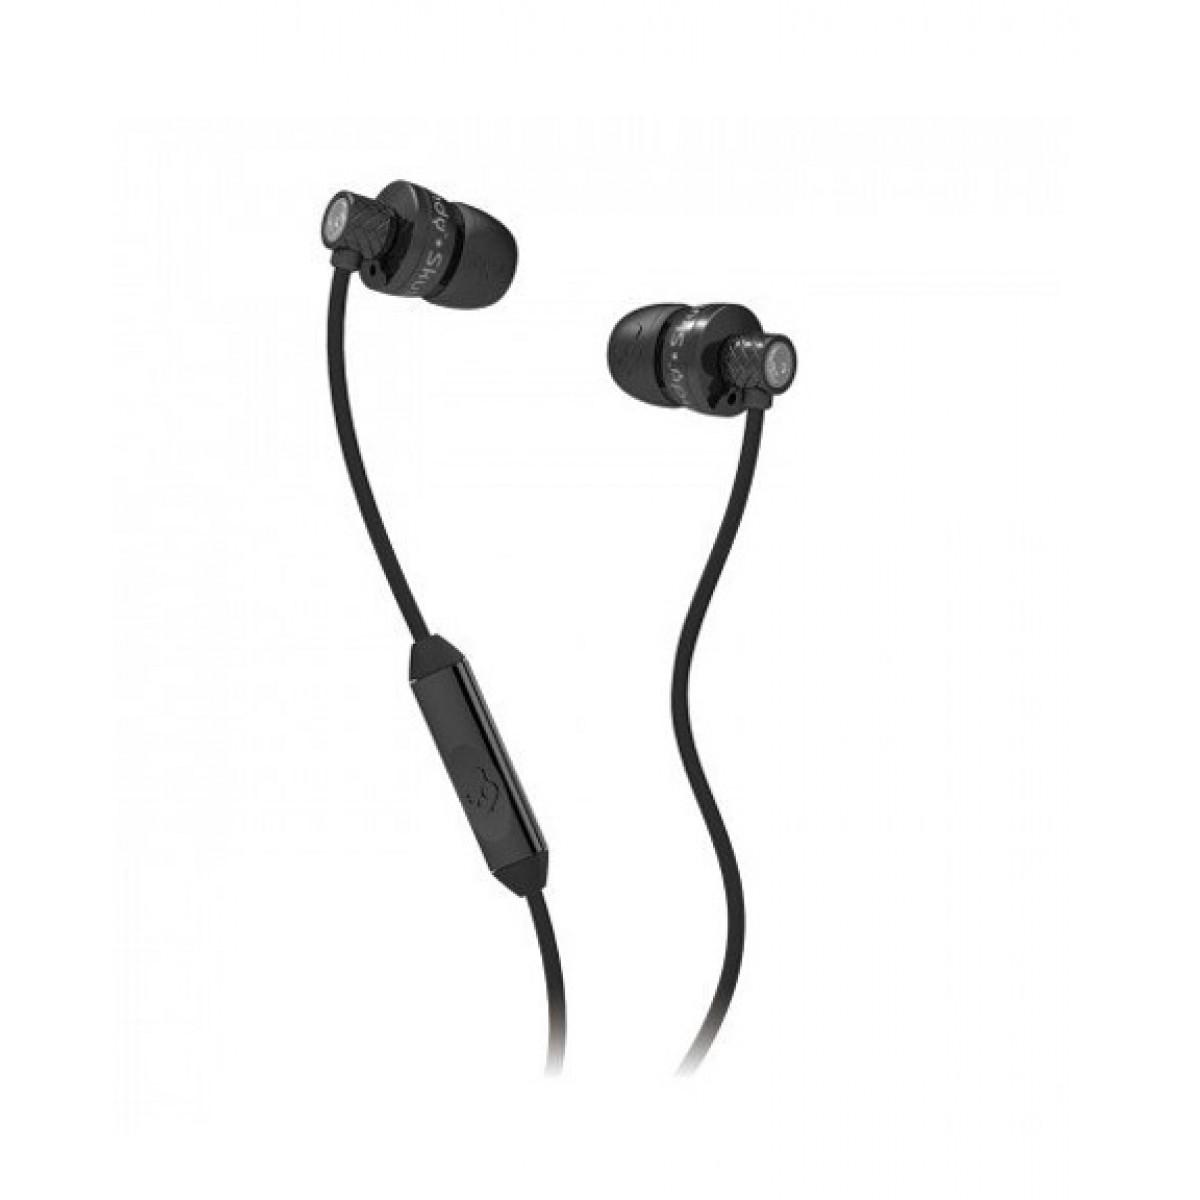 Skullcandy Titan In-Ear Headphones with Mic Black (S2TTDY-033)